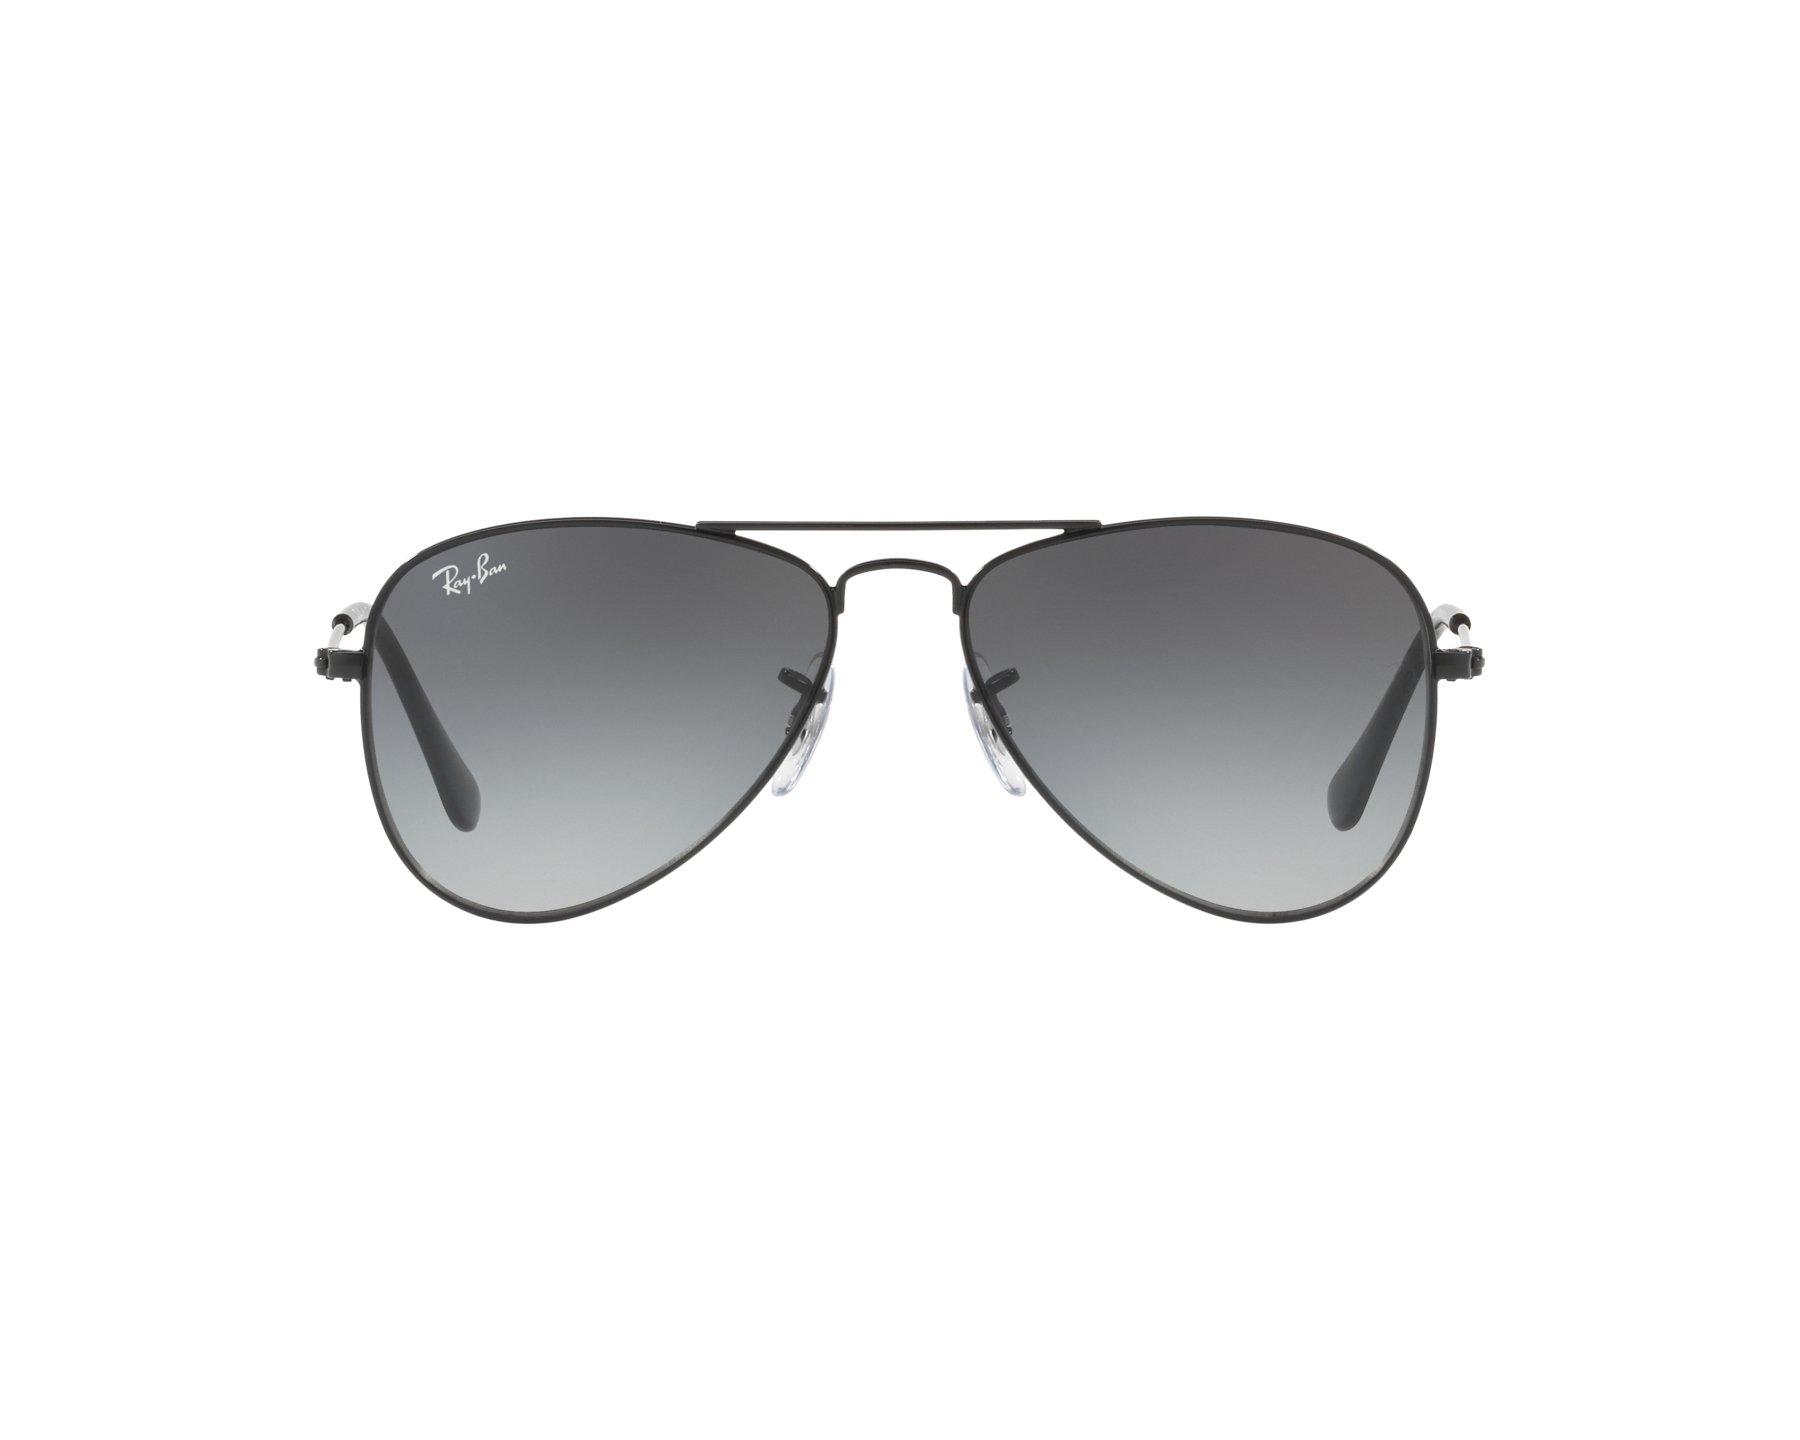 ray ban sonnenbrille junior rj 9506 s 220 11. Black Bedroom Furniture Sets. Home Design Ideas